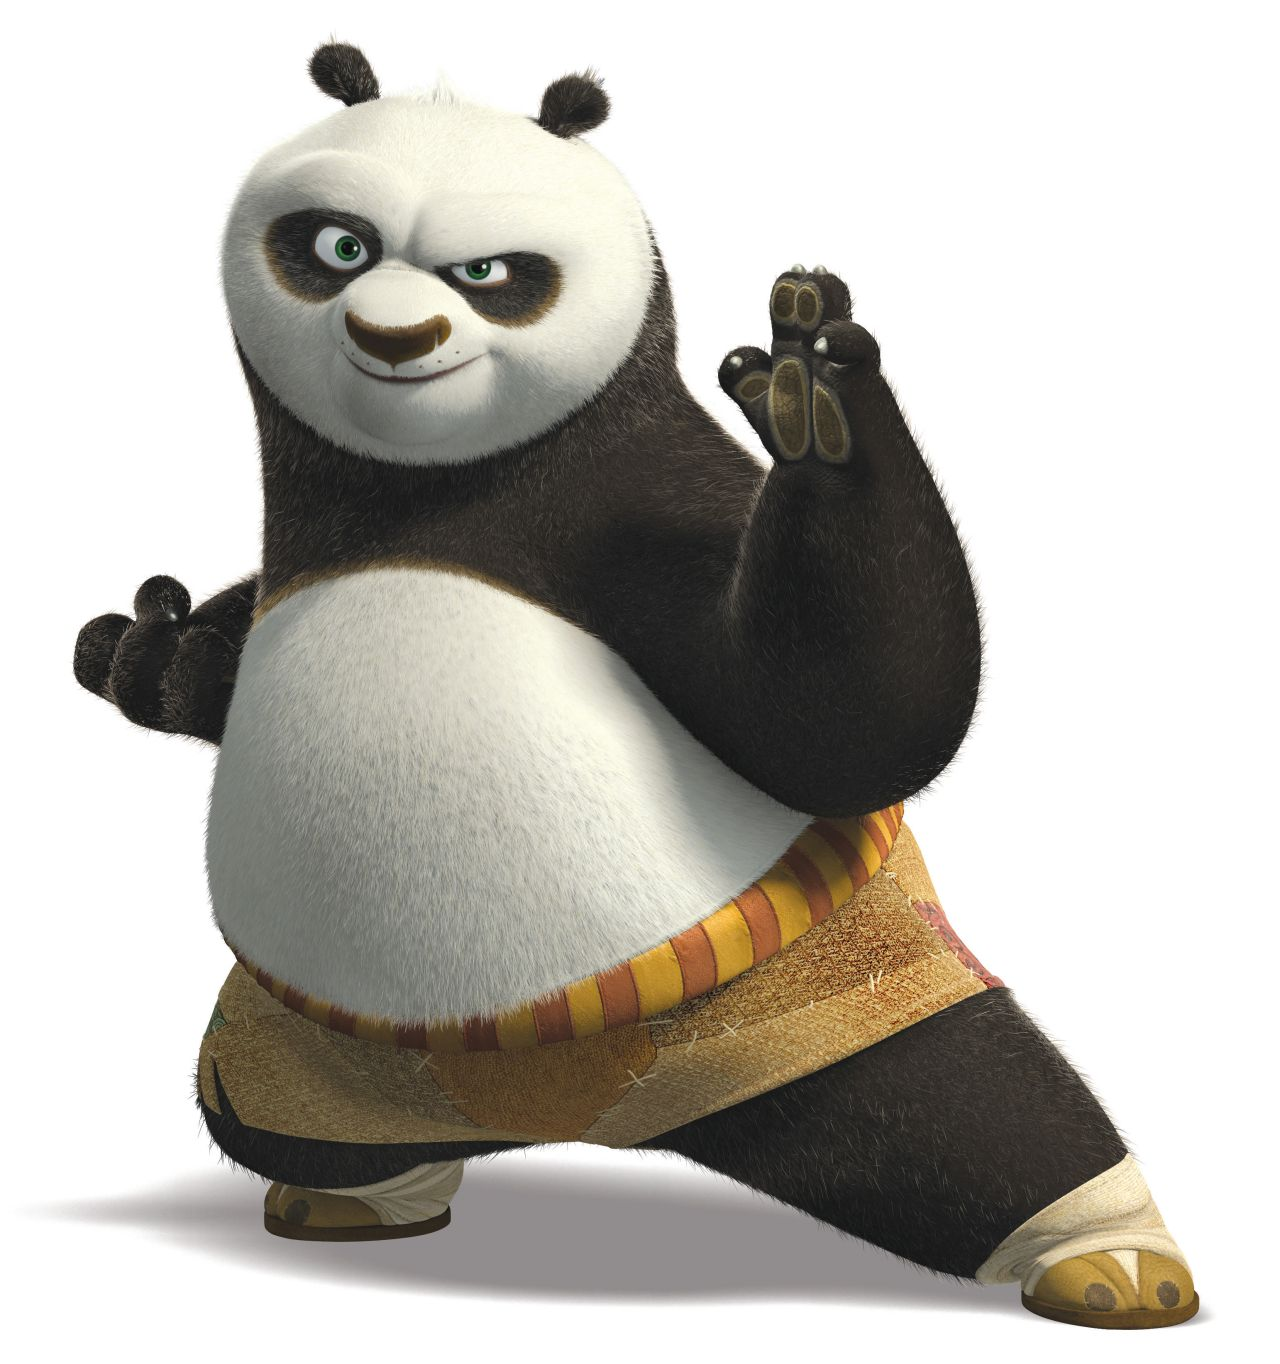 http://3.bp.blogspot.com/-j47xSBzpPHw/Te0doJ8zblI/AAAAAAAAUZ0/NecwL7VLFqs/s1600/kung-fu-panda-Po-2-desktop-wallpaper.jpg